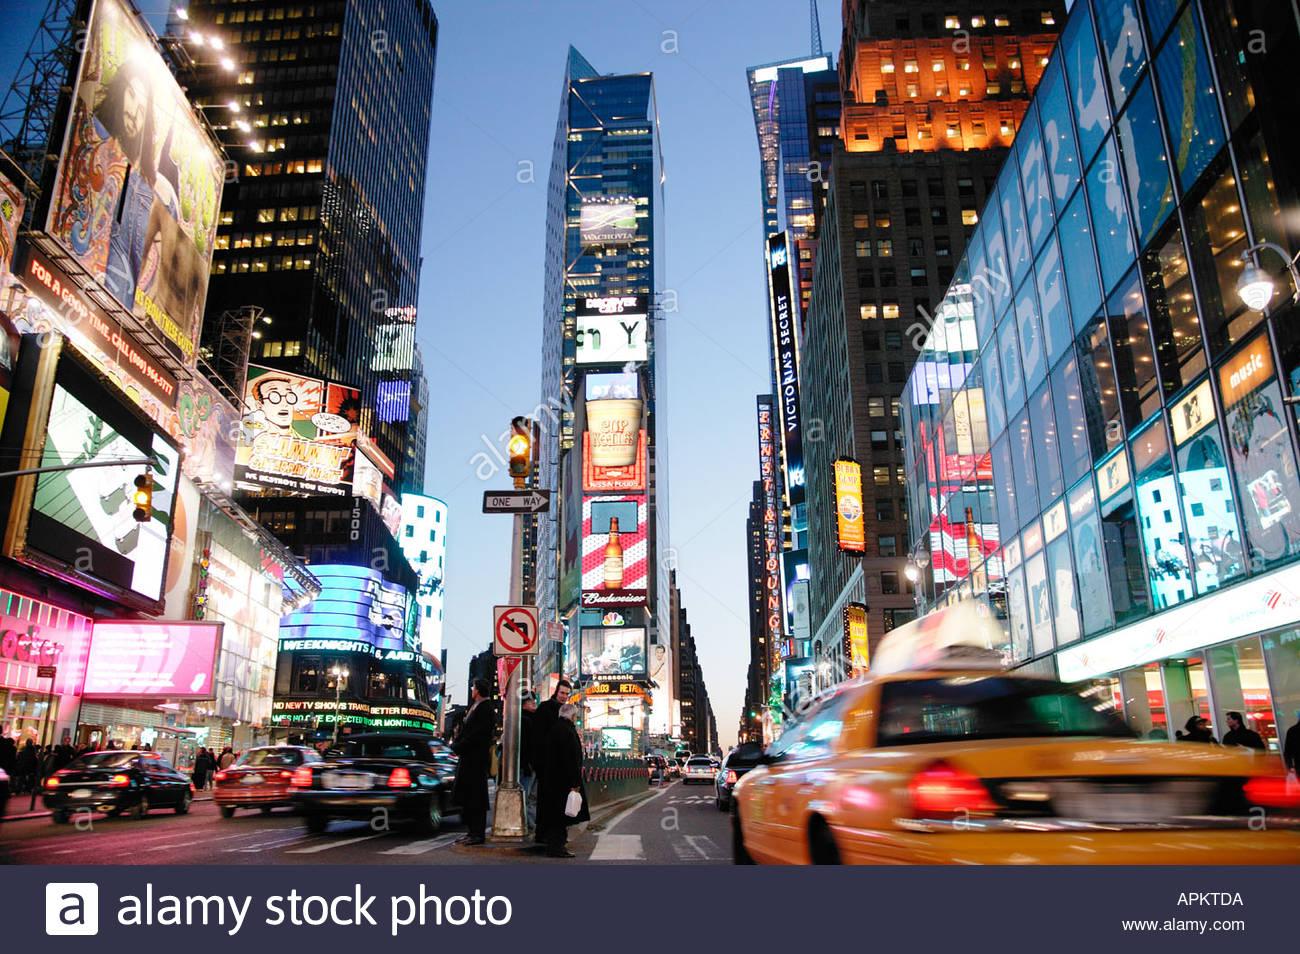 Times Square. (NYC, New York, USA) - Stock Image